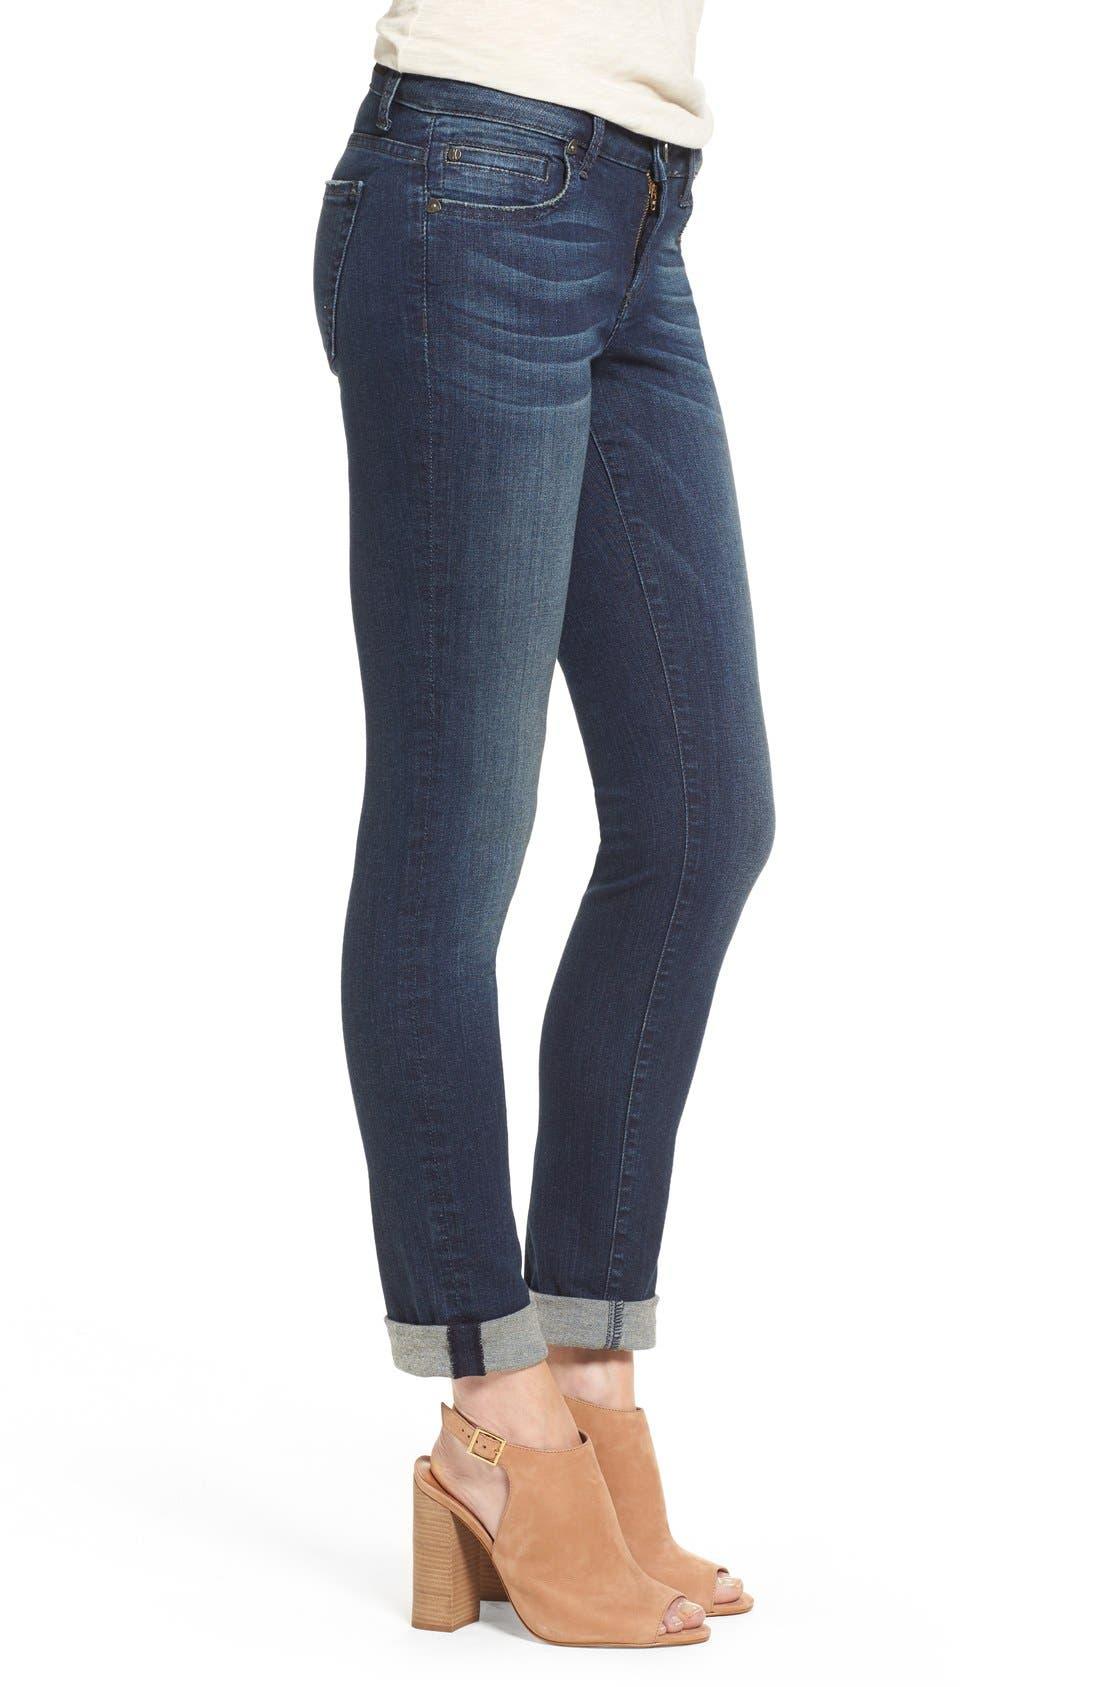 Alternate Image 3  - Kut from the Kloth 'Catherine' Slim Boyfriend Jeans (Carefulness) (Regular & Petite)